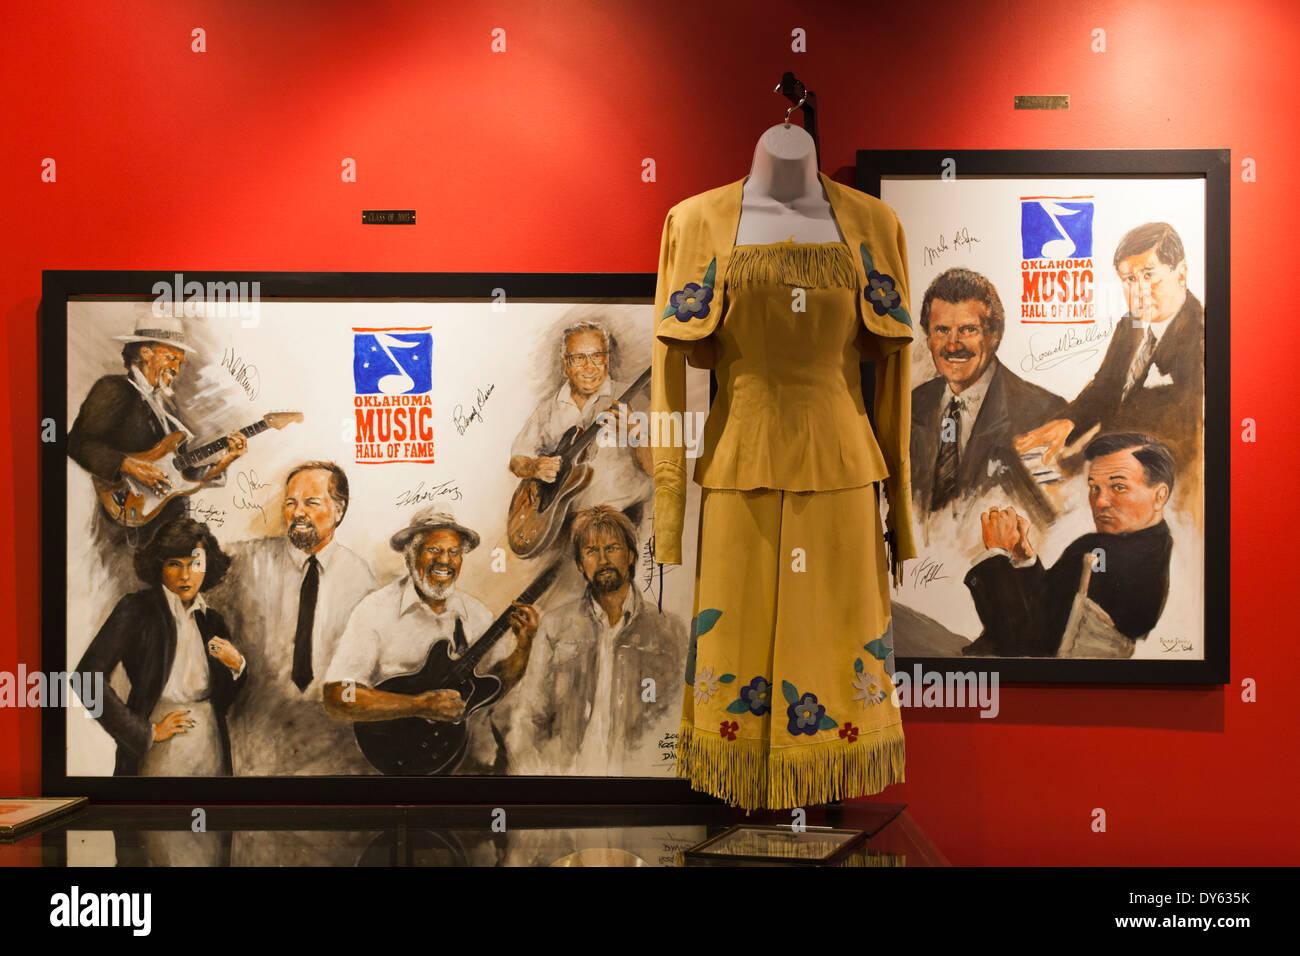 USA, Oklahoma, Muskogee, Oklahoma Music Hall of Fame interior display Stock Photo